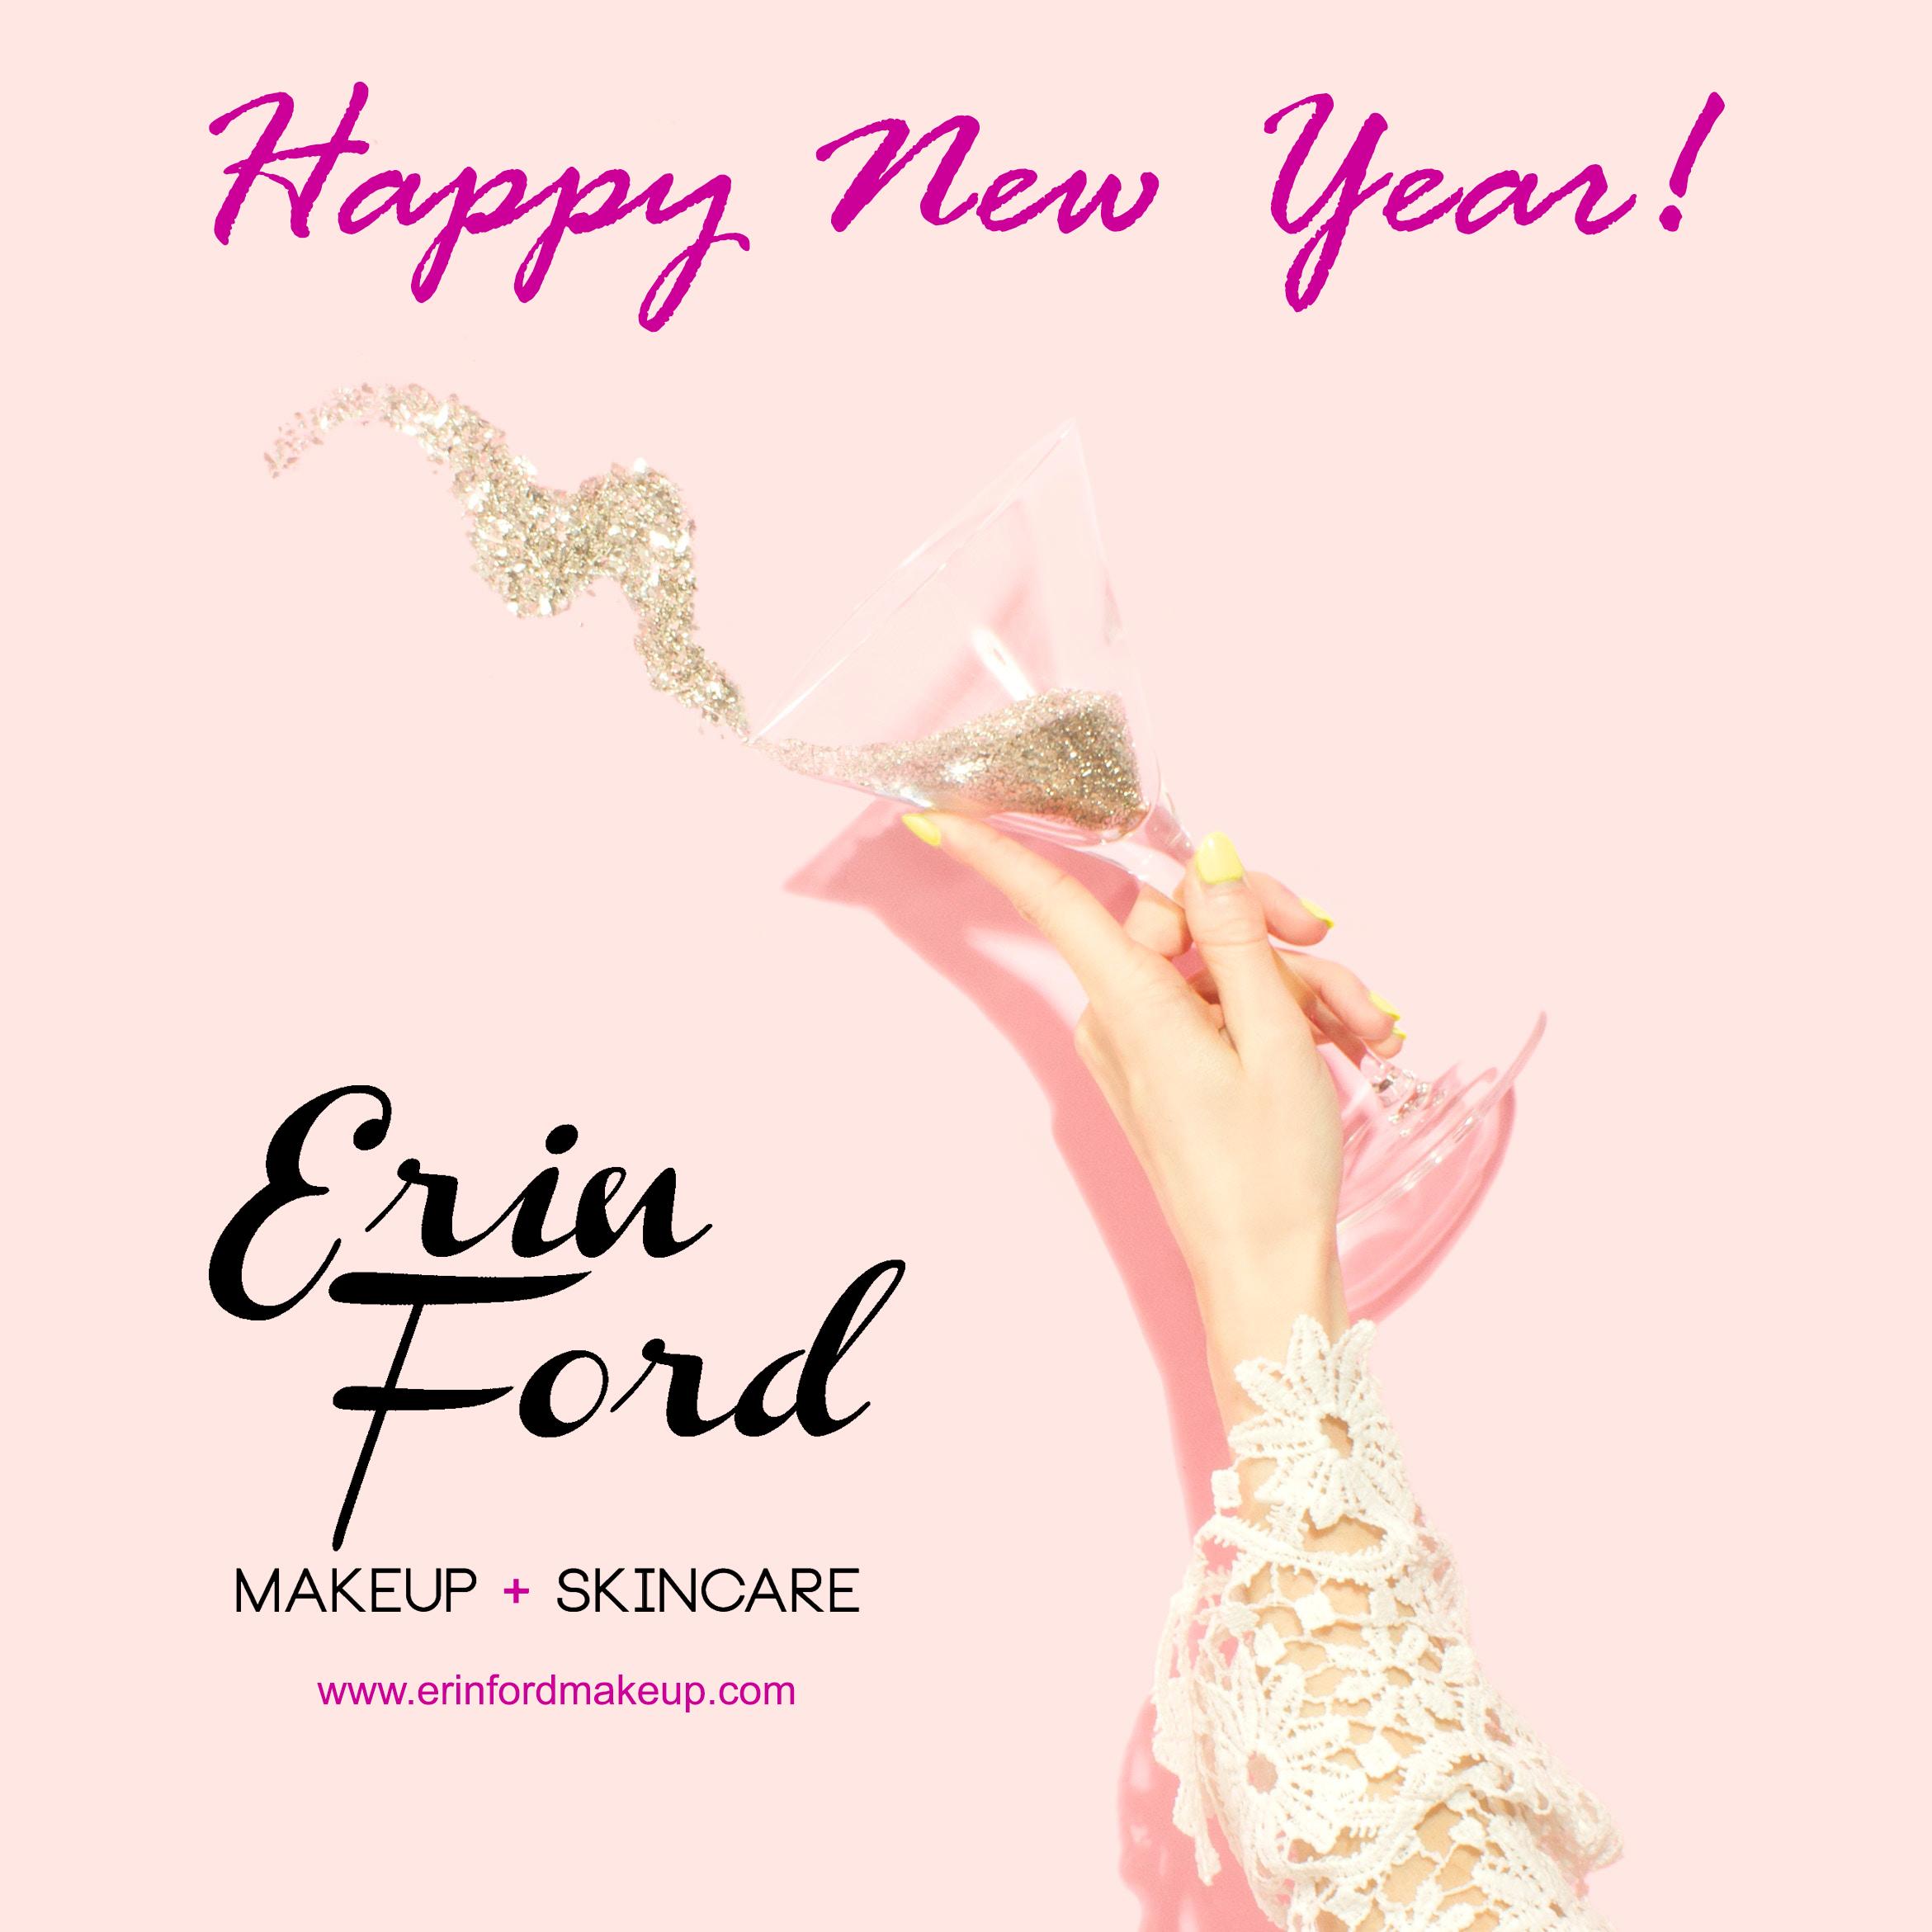 HAPPY NEW YEAR AD.jpg